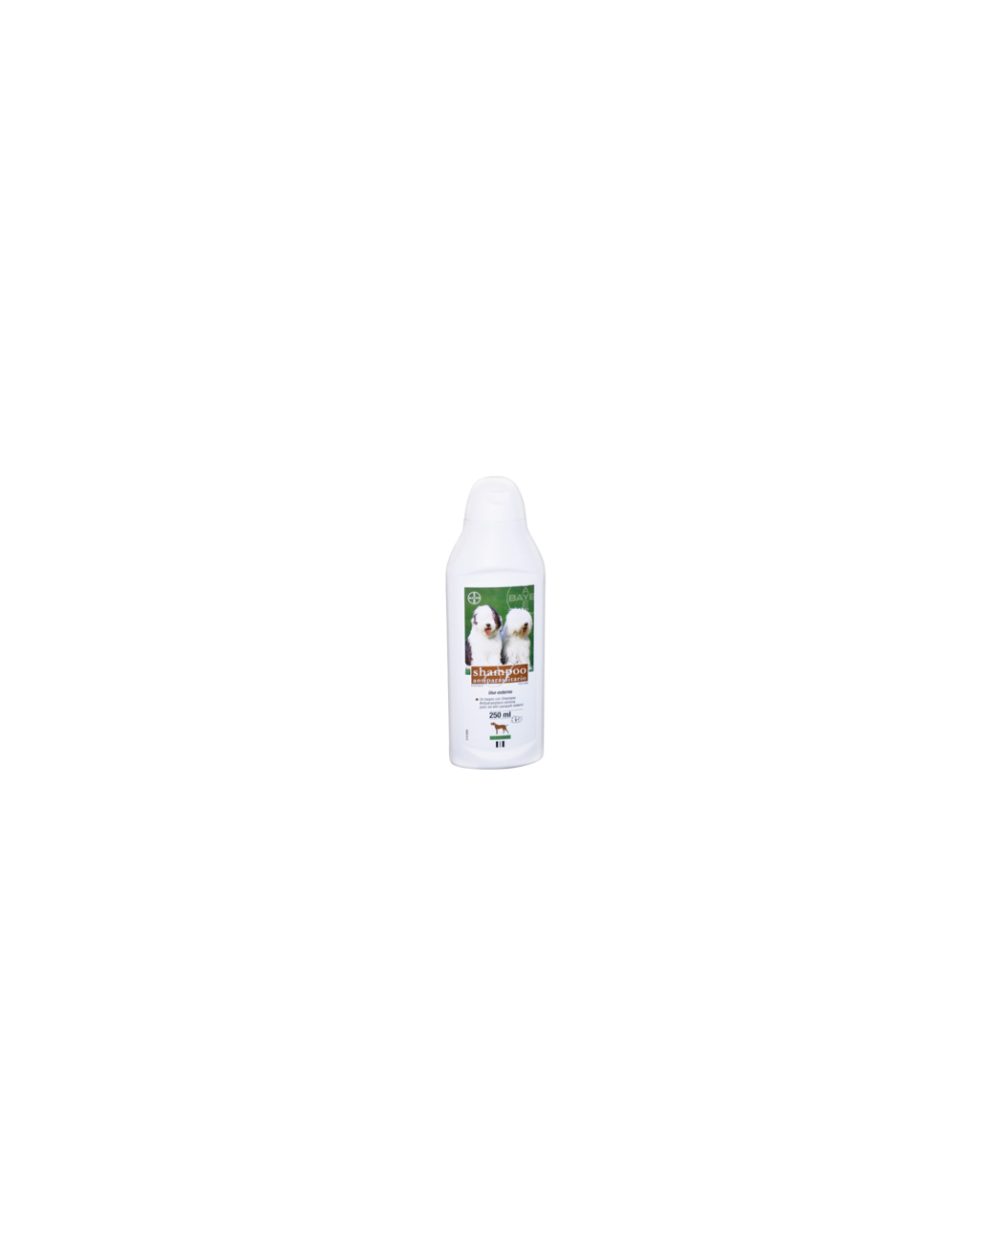 Bayer Shampo Antiparassitario